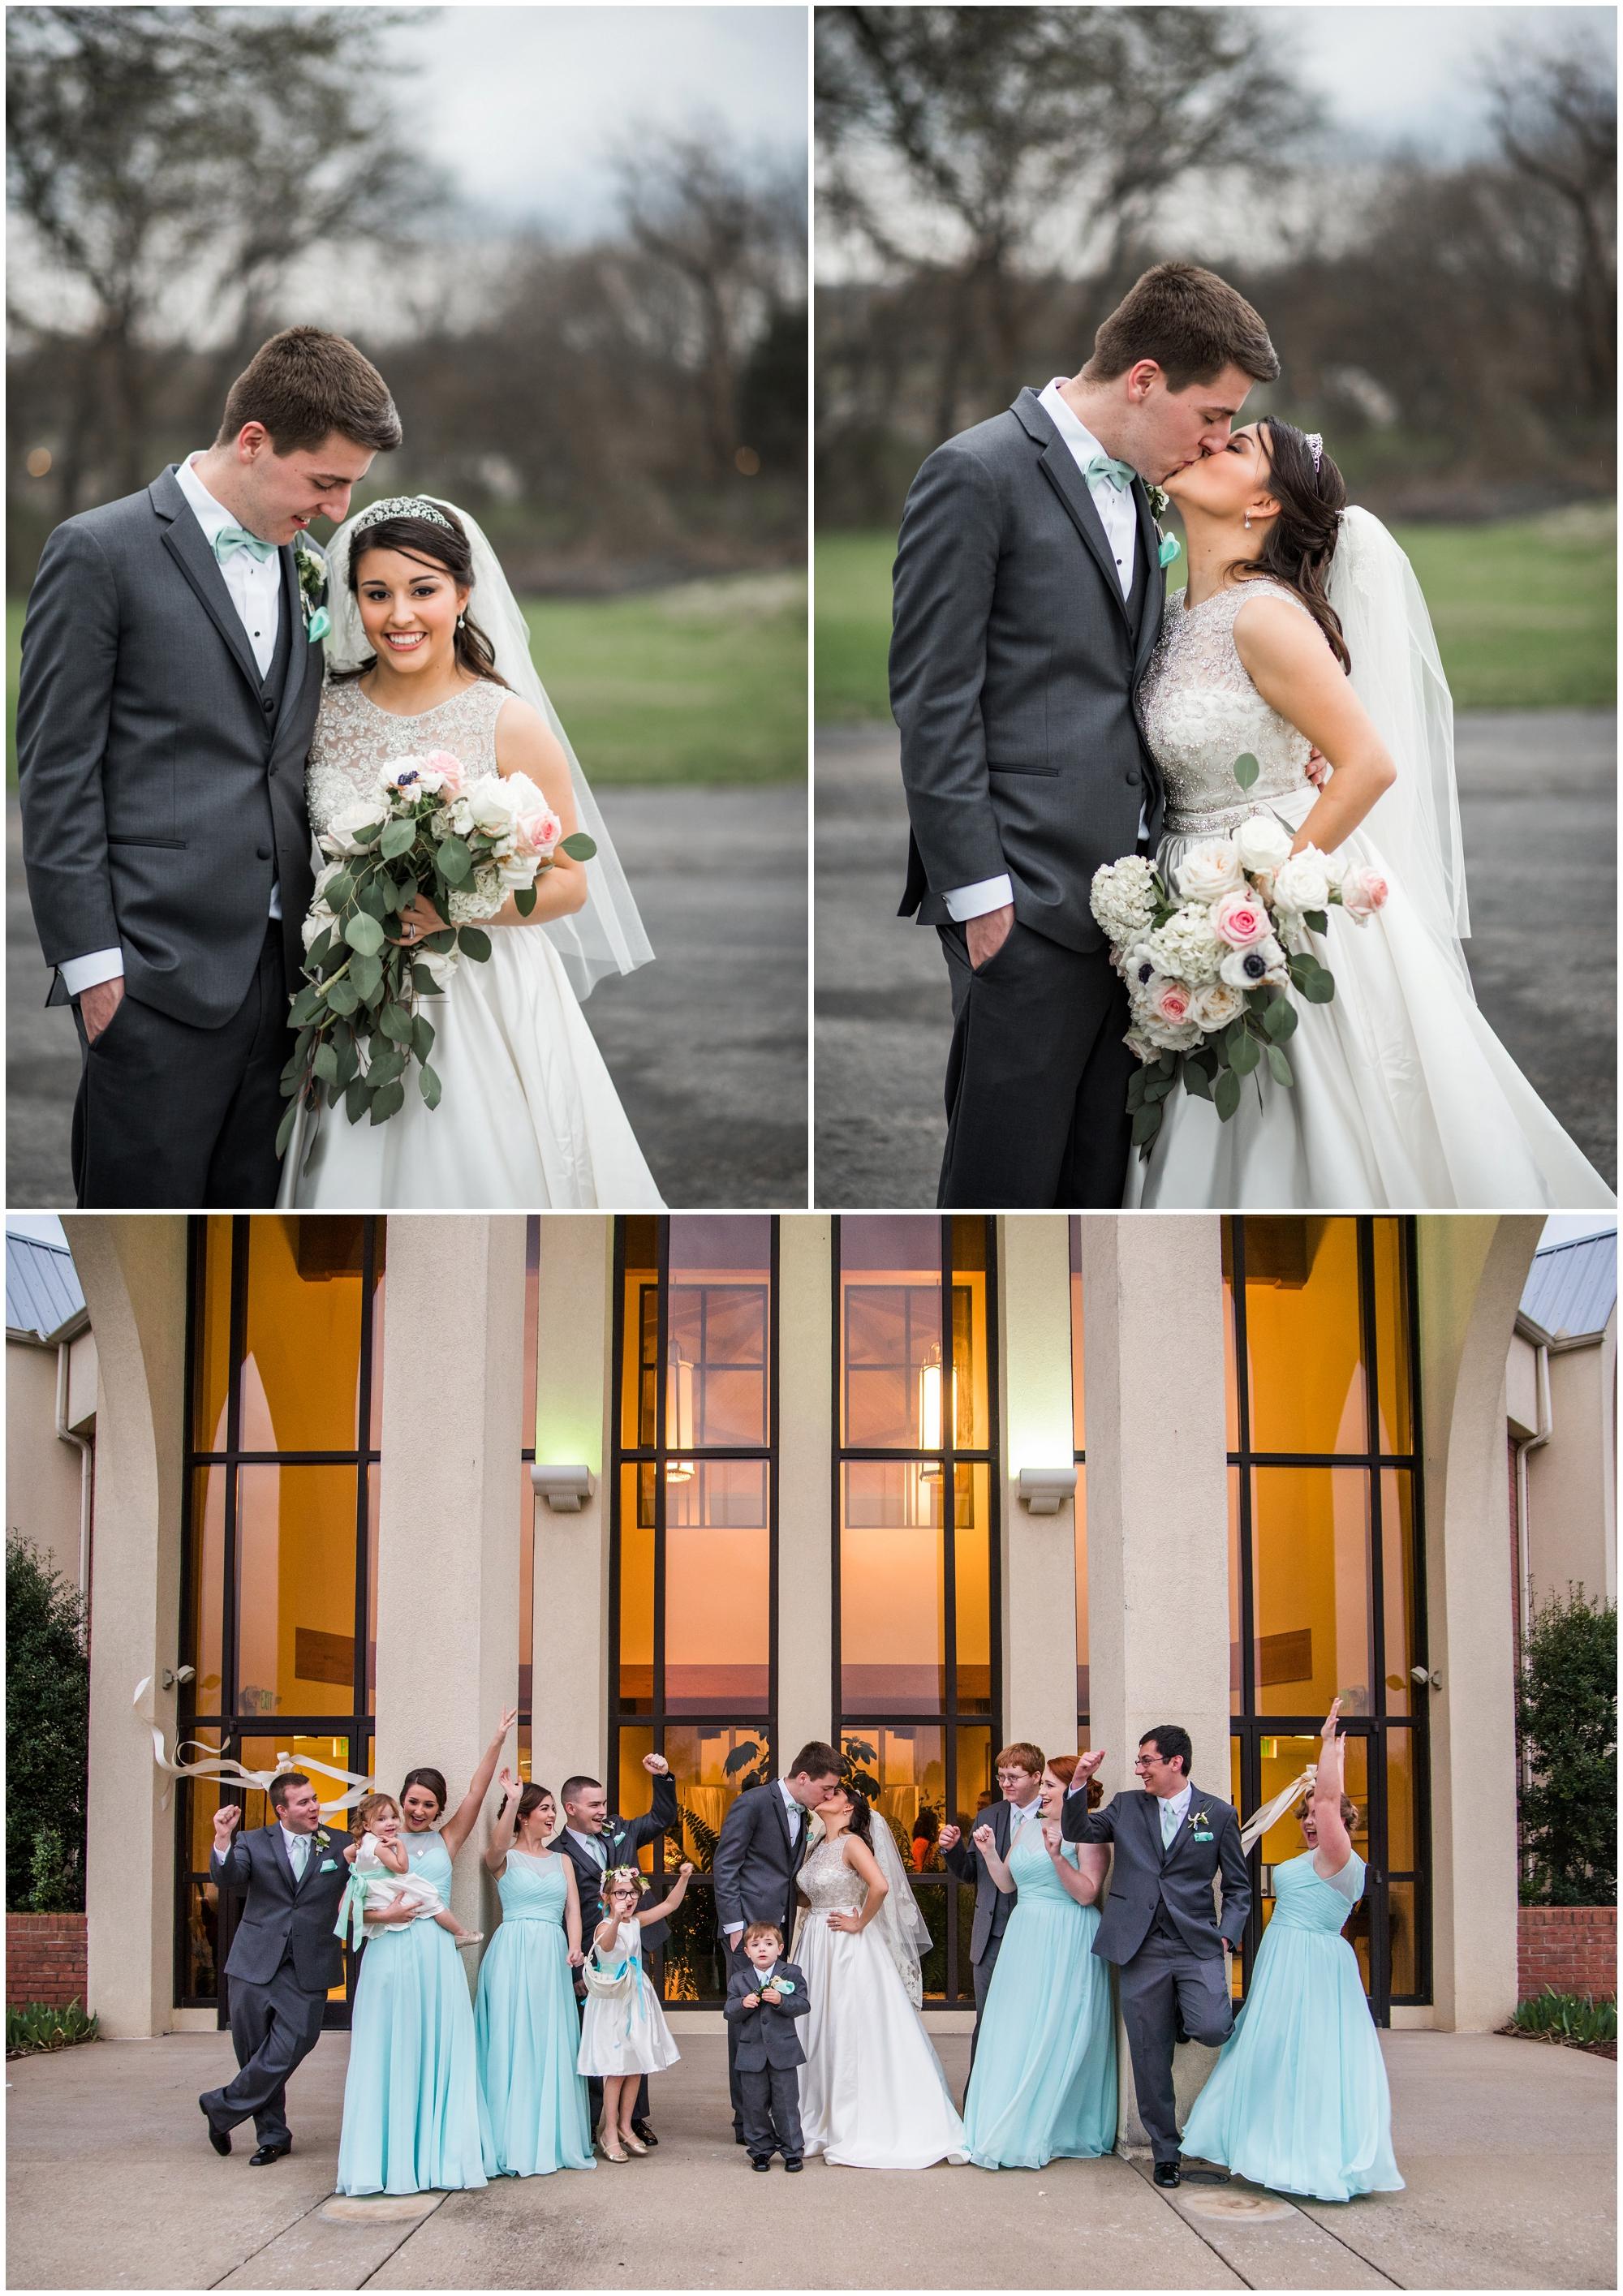 lyndsey_caleb_wedding_indian_hills-4408.jpg